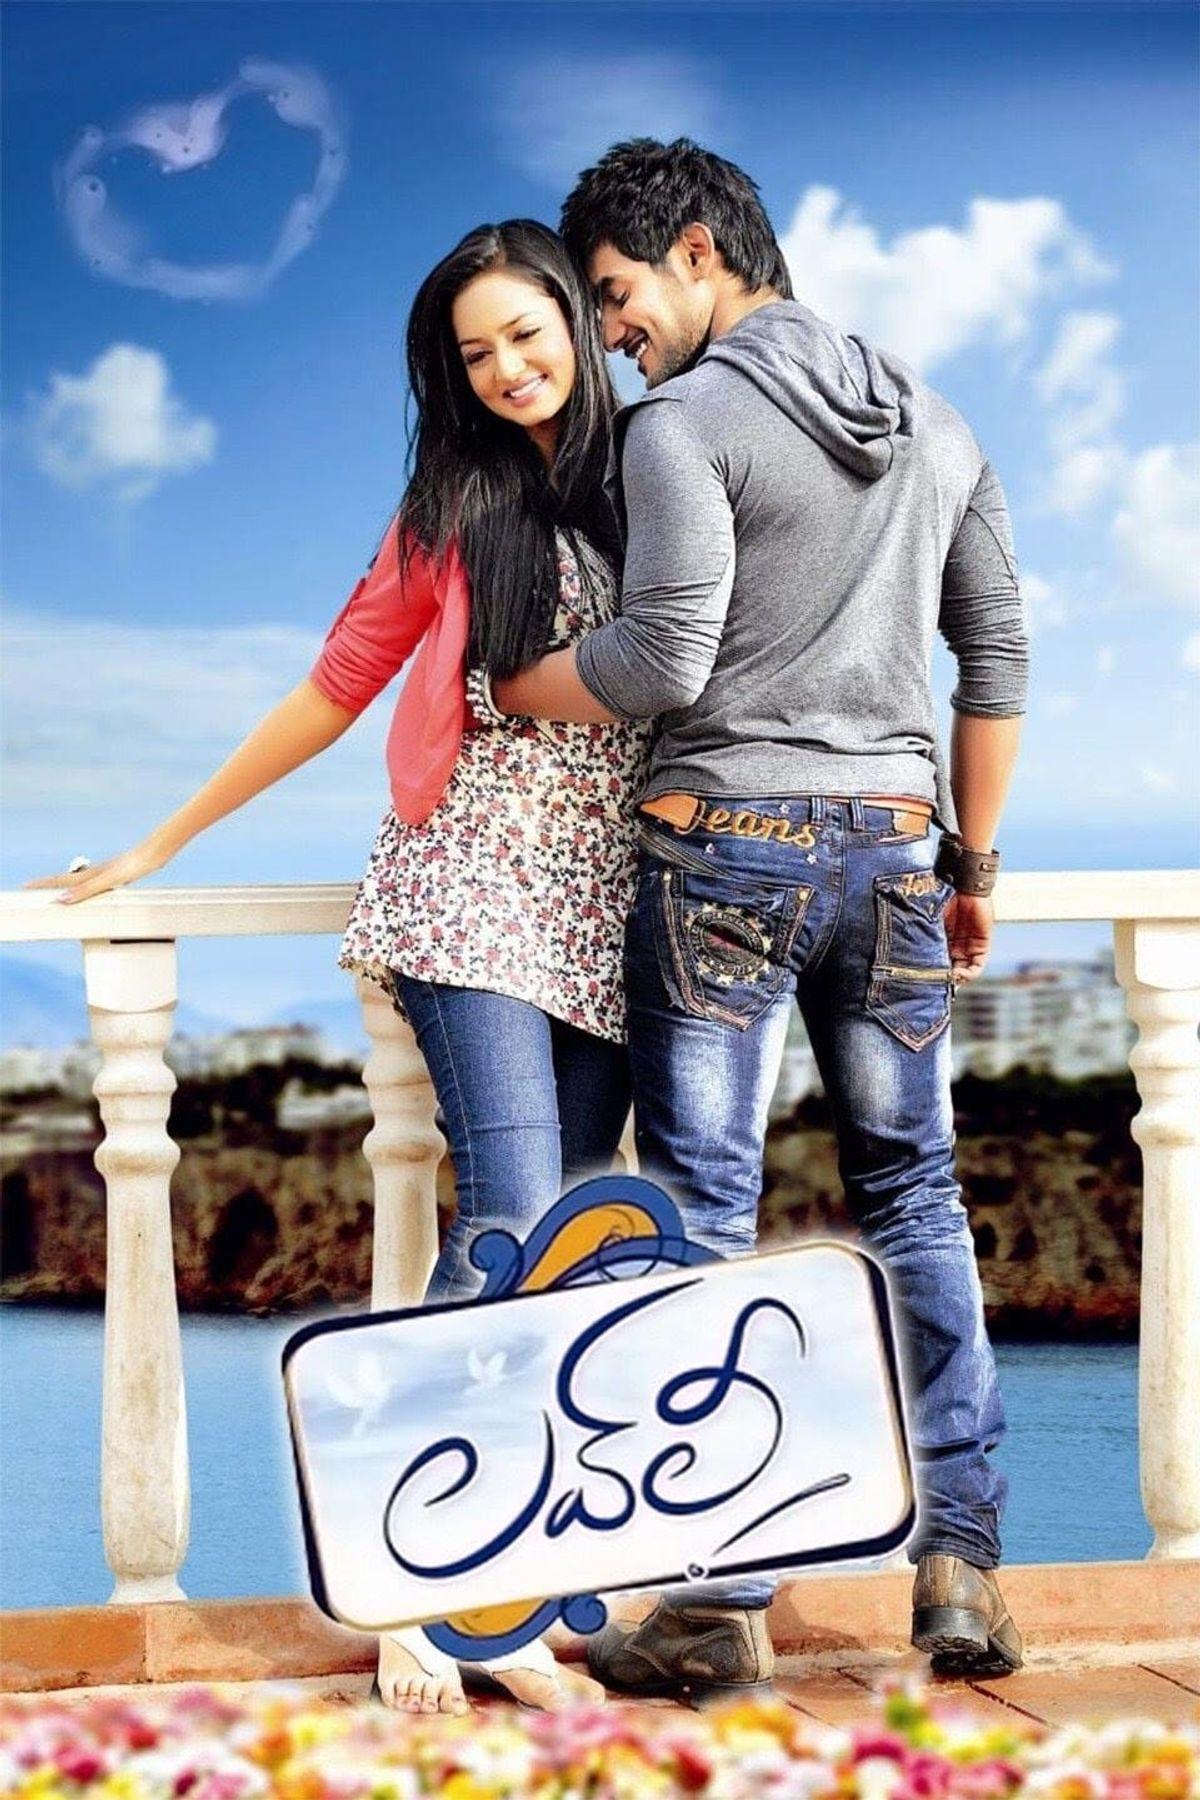 Paruchuri Gopala Krishna Best Movies, TV Shows and Web Series List